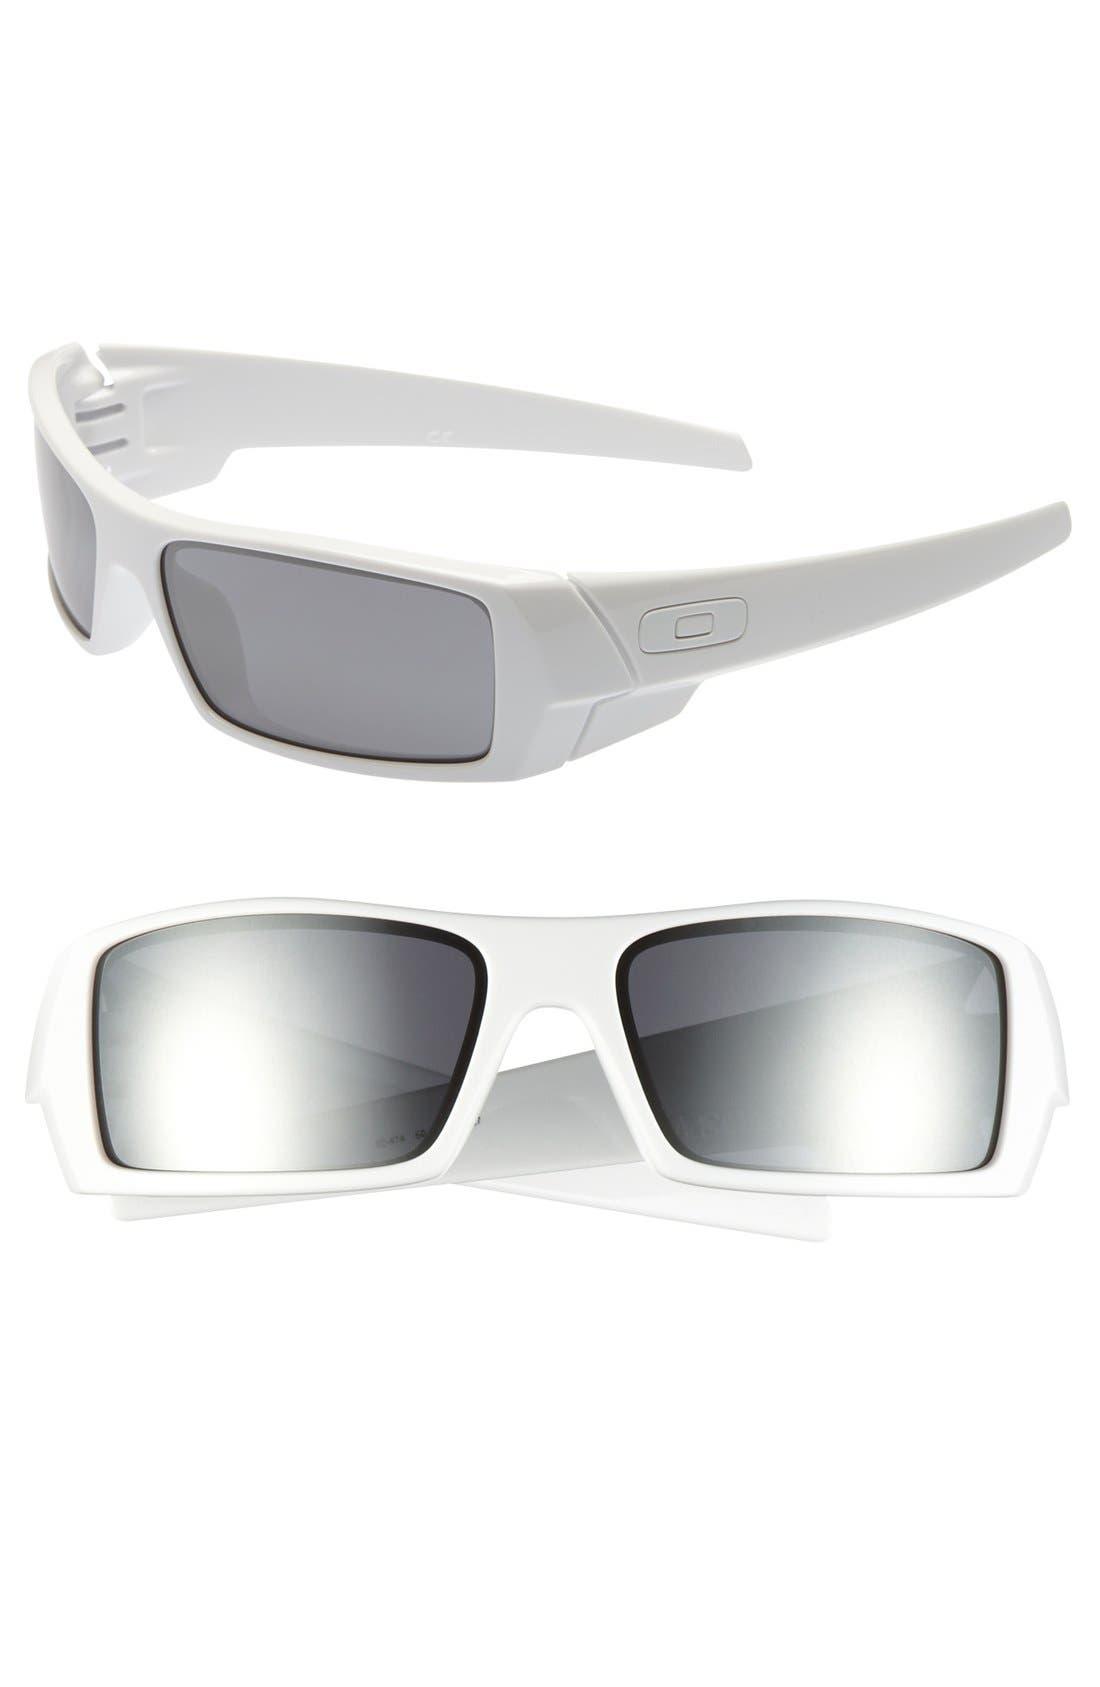 Main Image - Oakley 'Gascan' 60mm Sunglasses